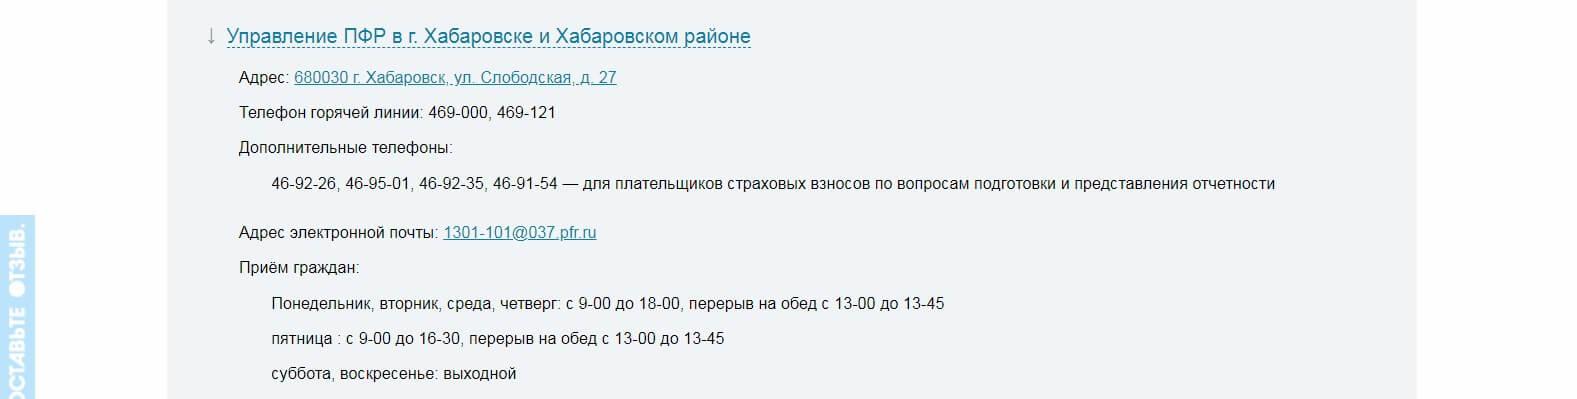 Пенсионный фонд Хабаровск